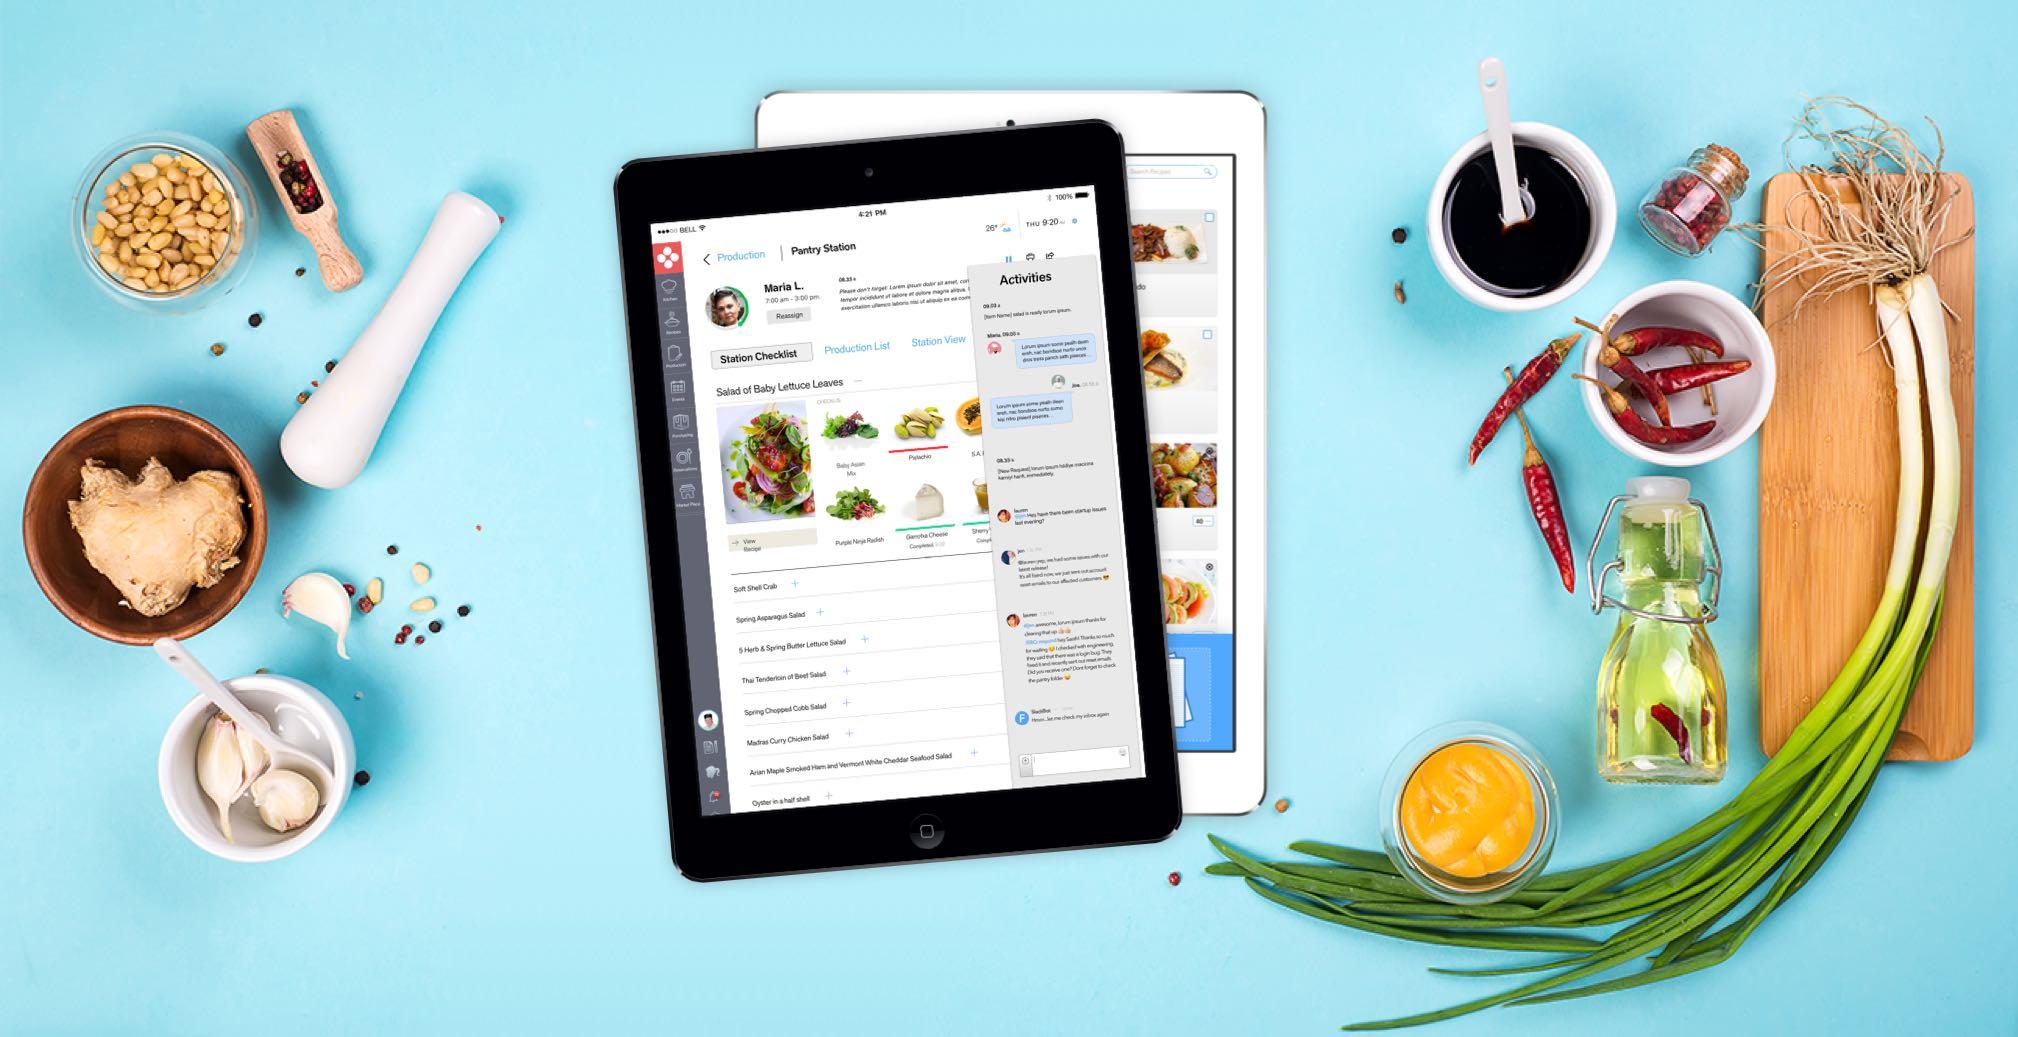 FoodTech: Commercial Kitchen Management Application | PRADY